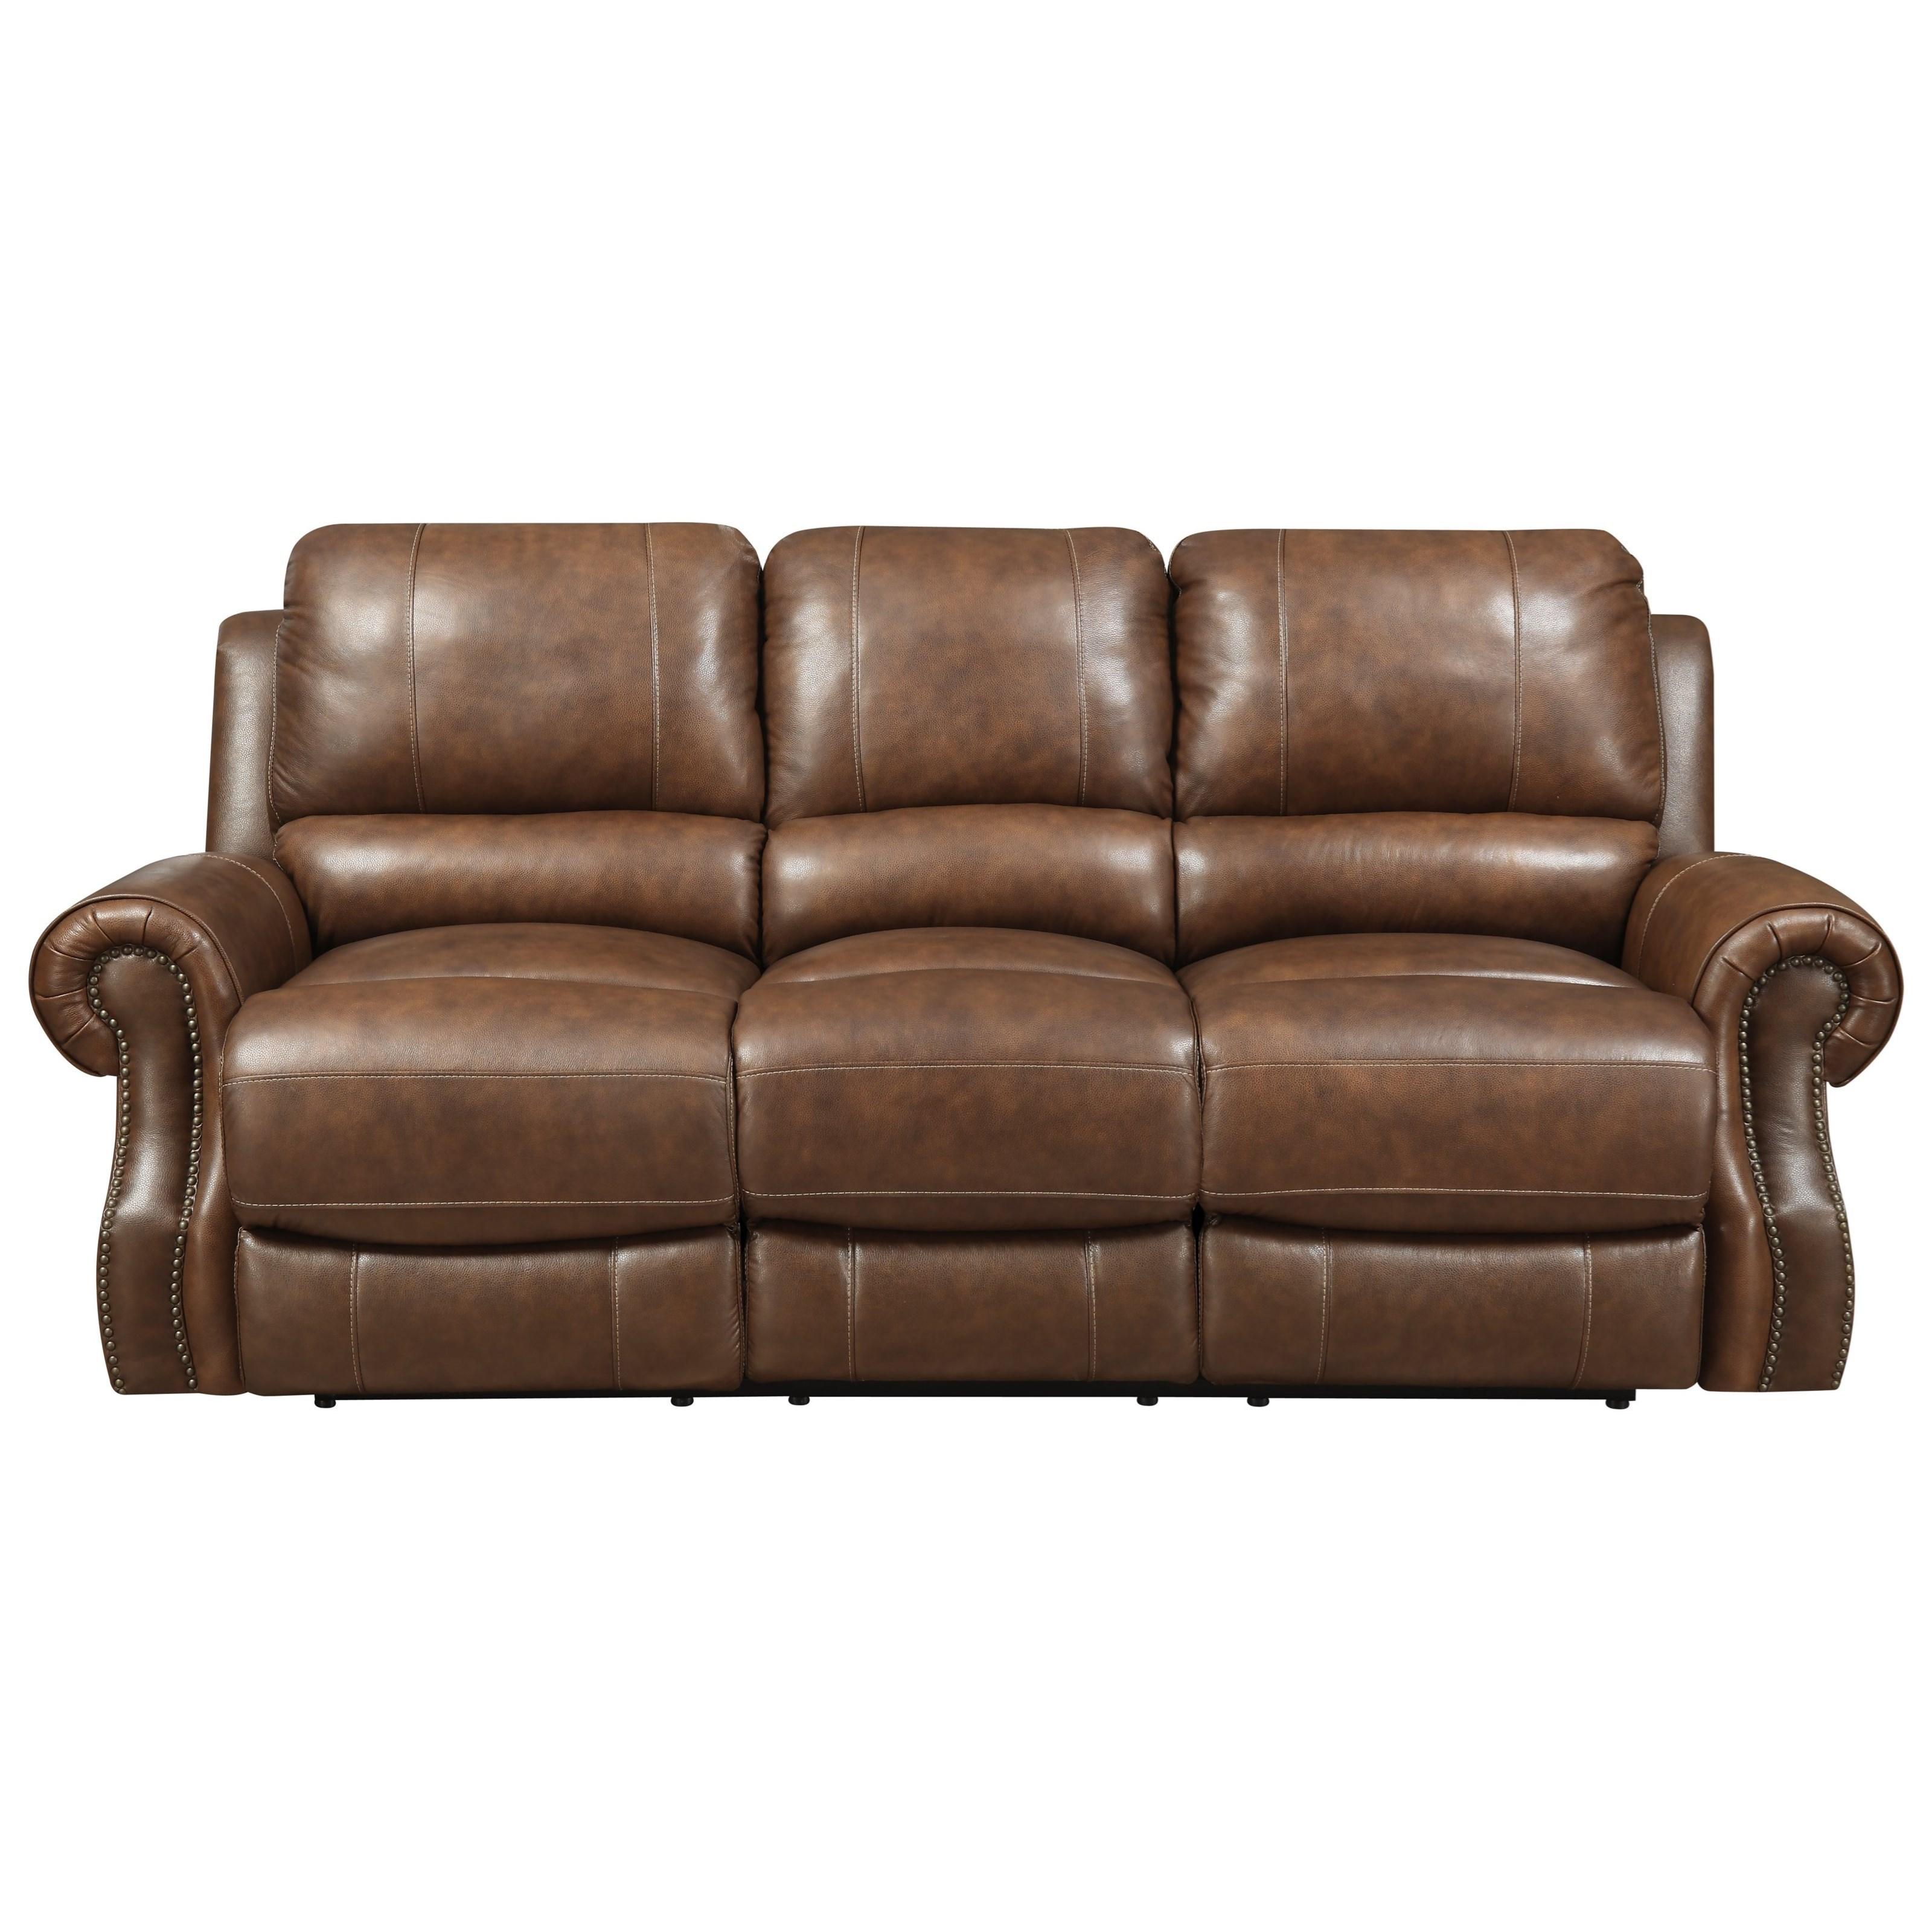 Elements International Walker Power Motion Sofa - Item Number: UWKxx305P-Saddle